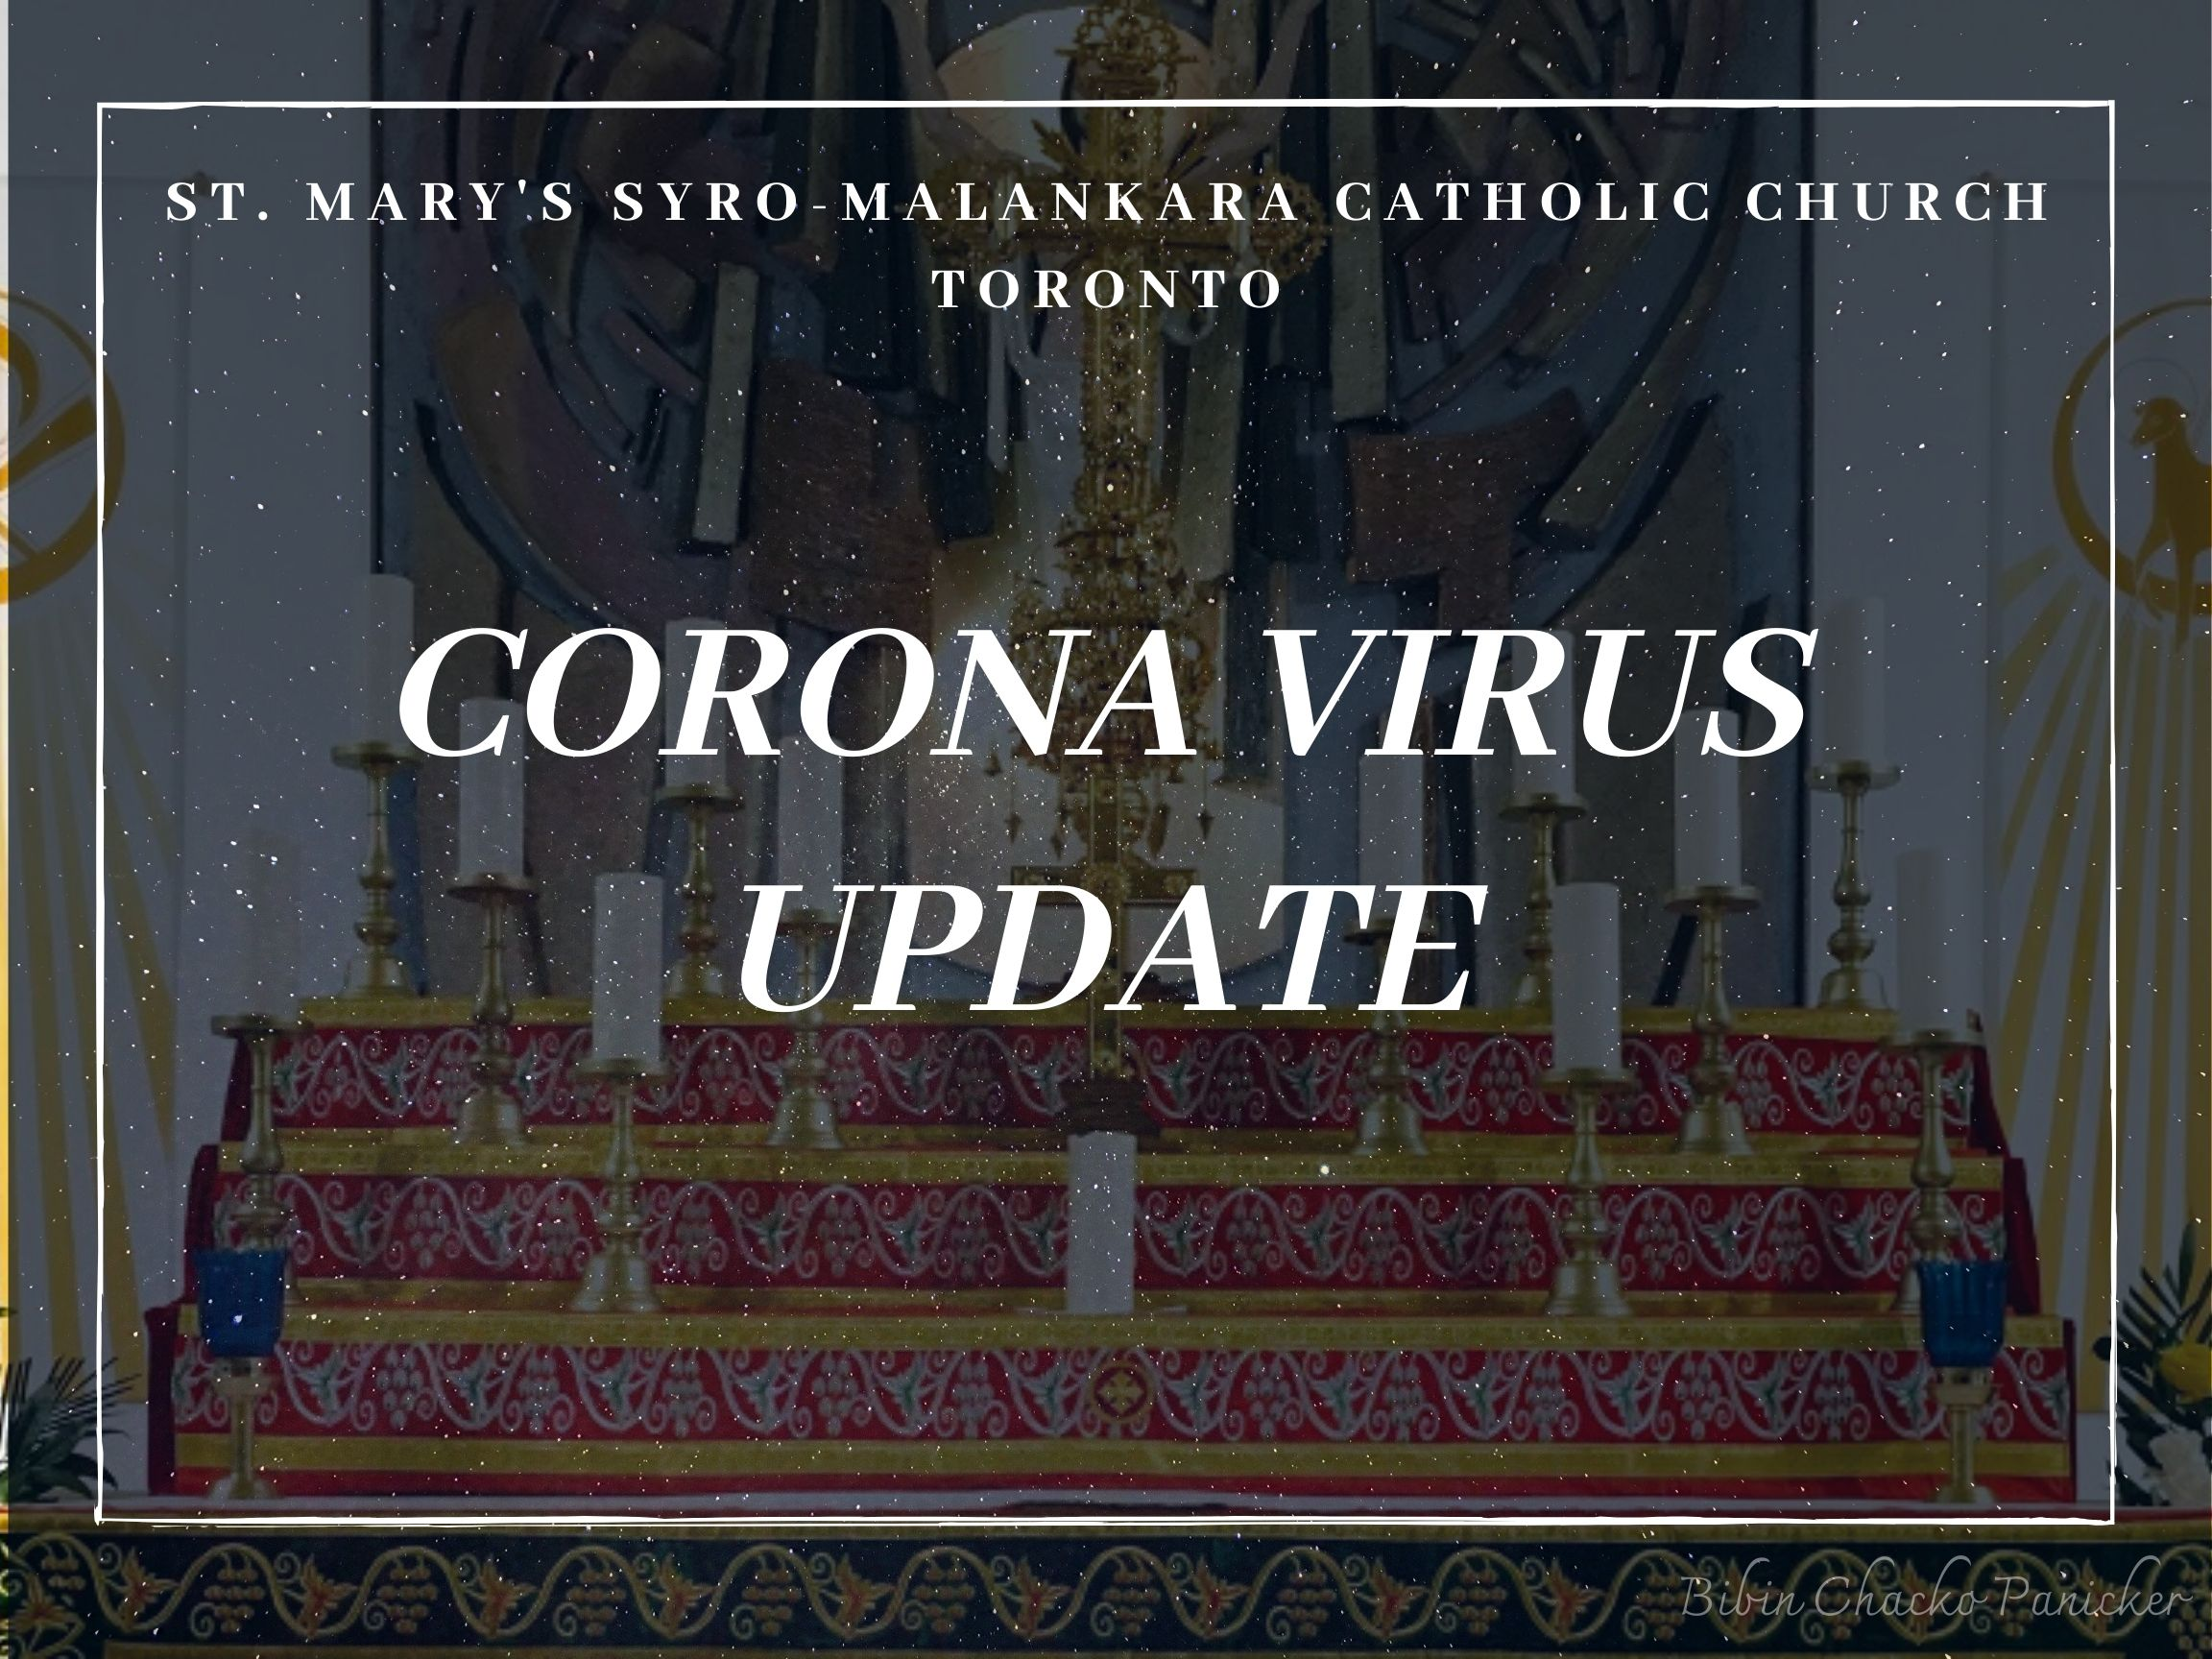 Corona Virus Update - St Marys' Syro-Malankara Catholic Church, Toronto